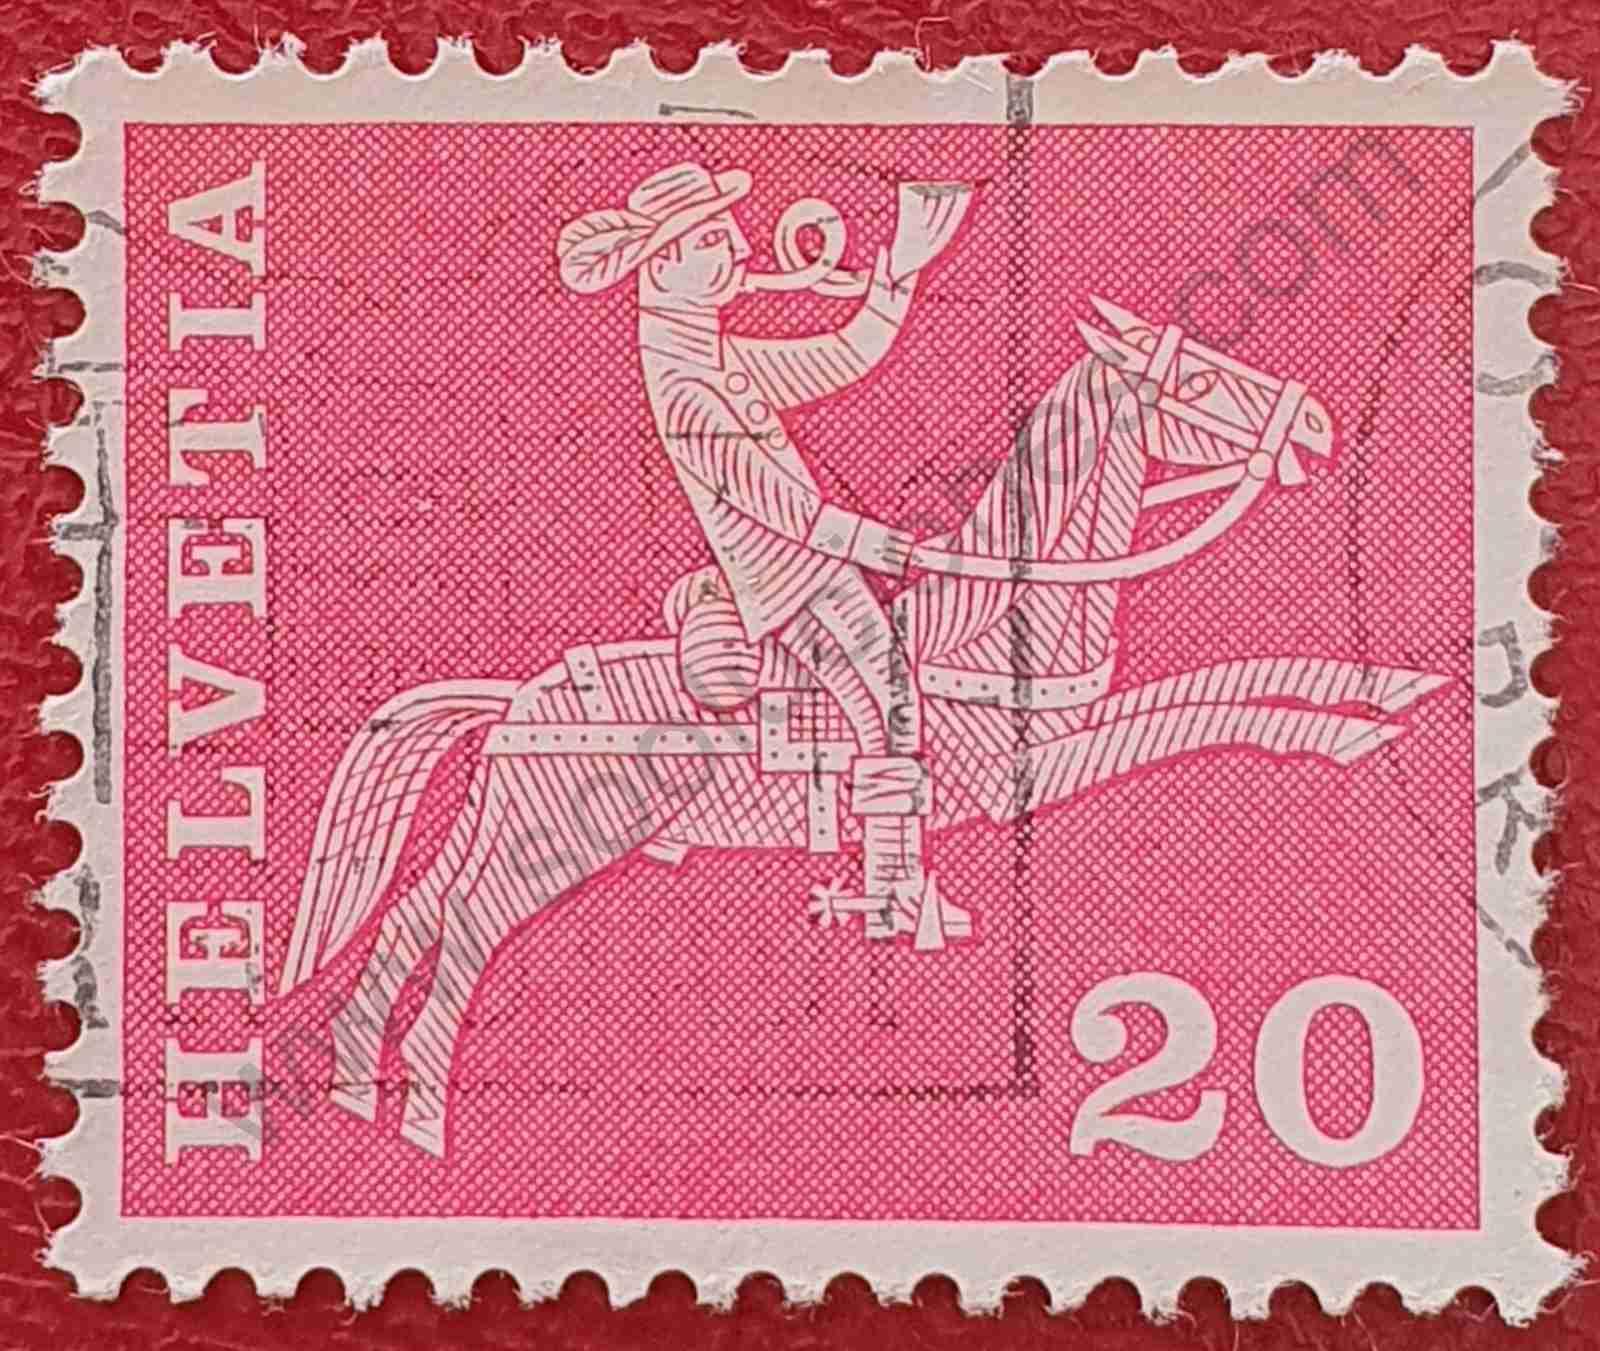 Sello jinete correos - Suiza 1960 variante